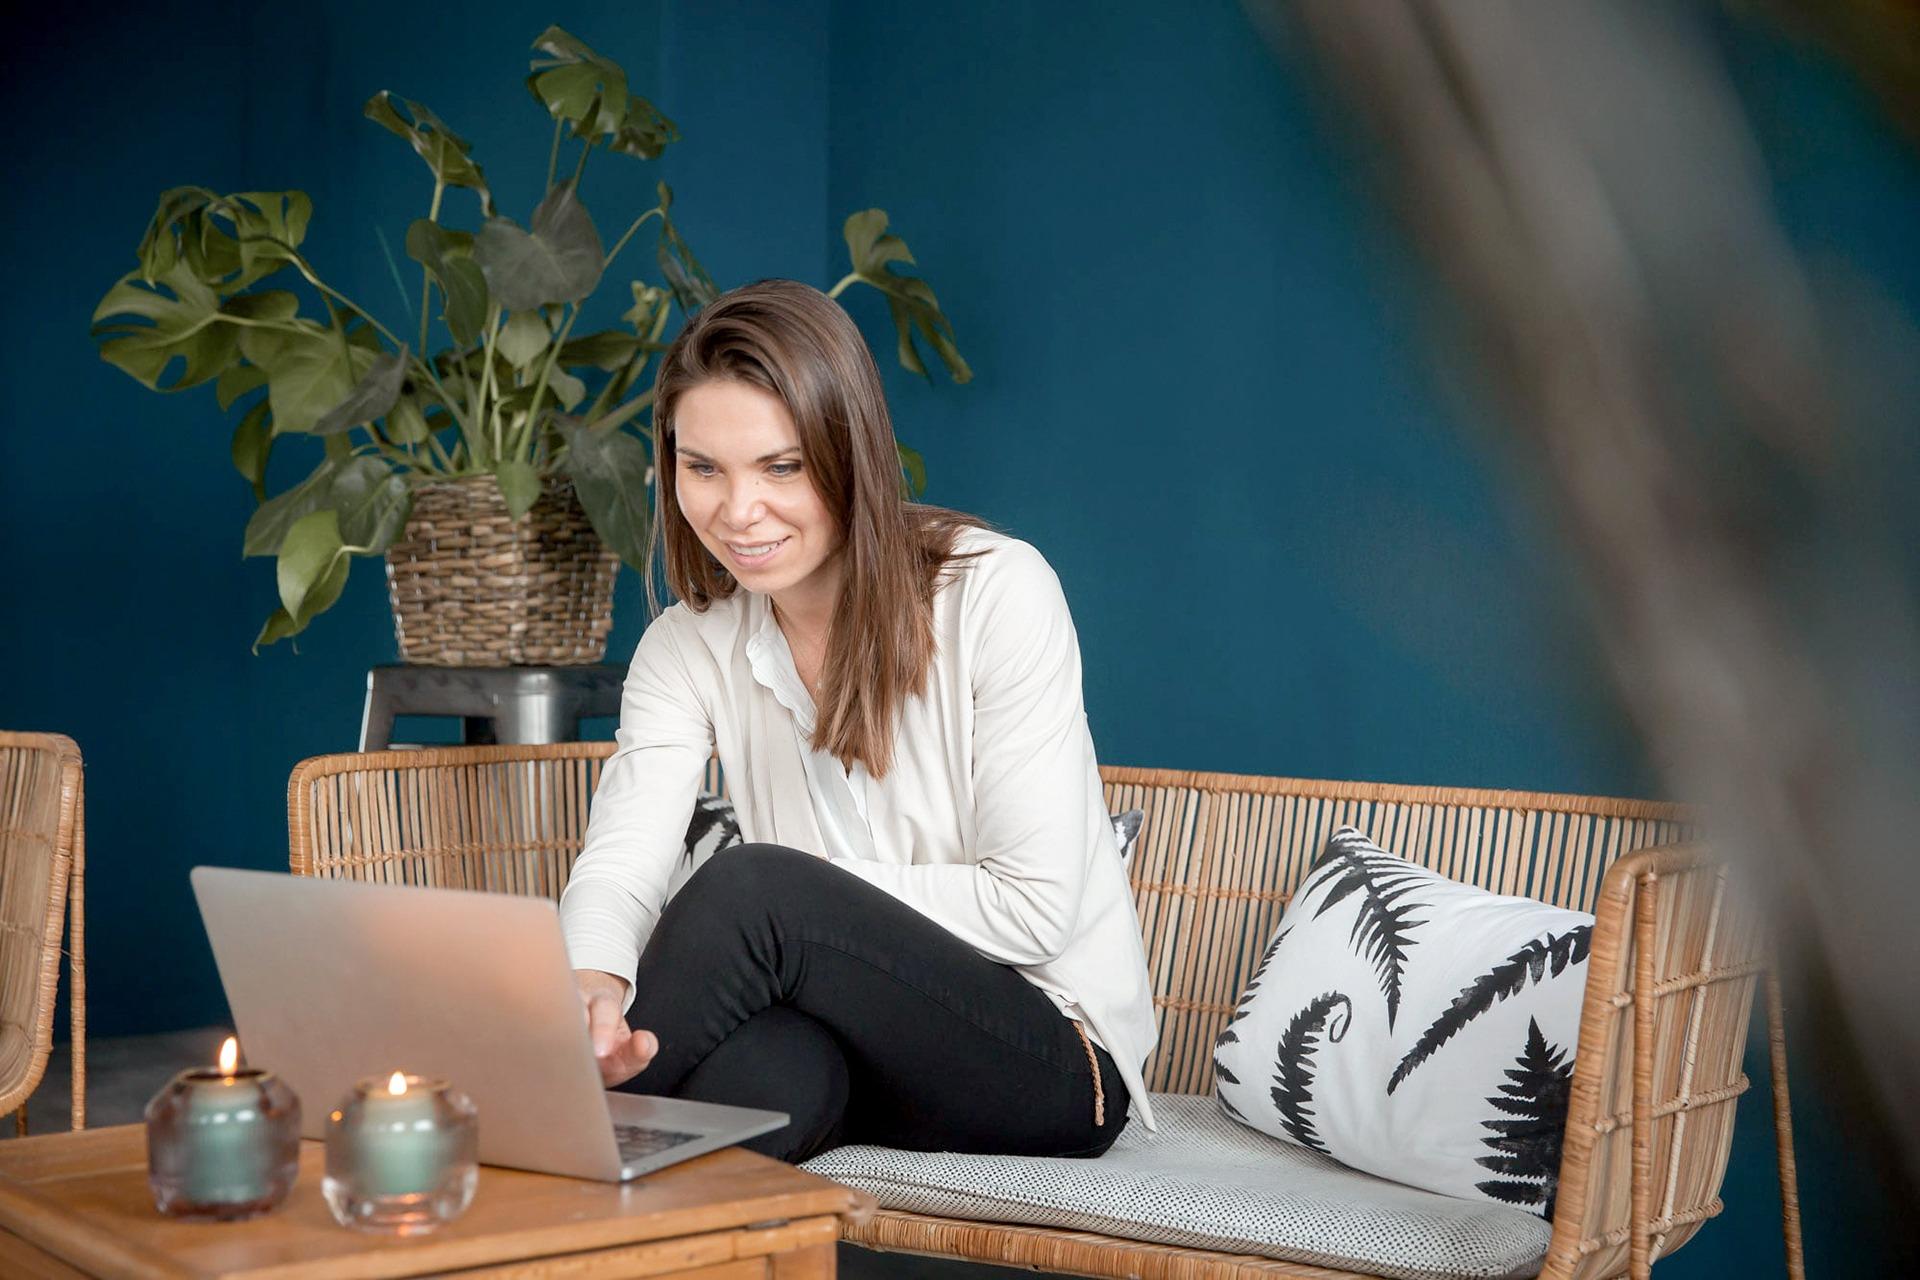 Frau am Laptop auf einem Sofa